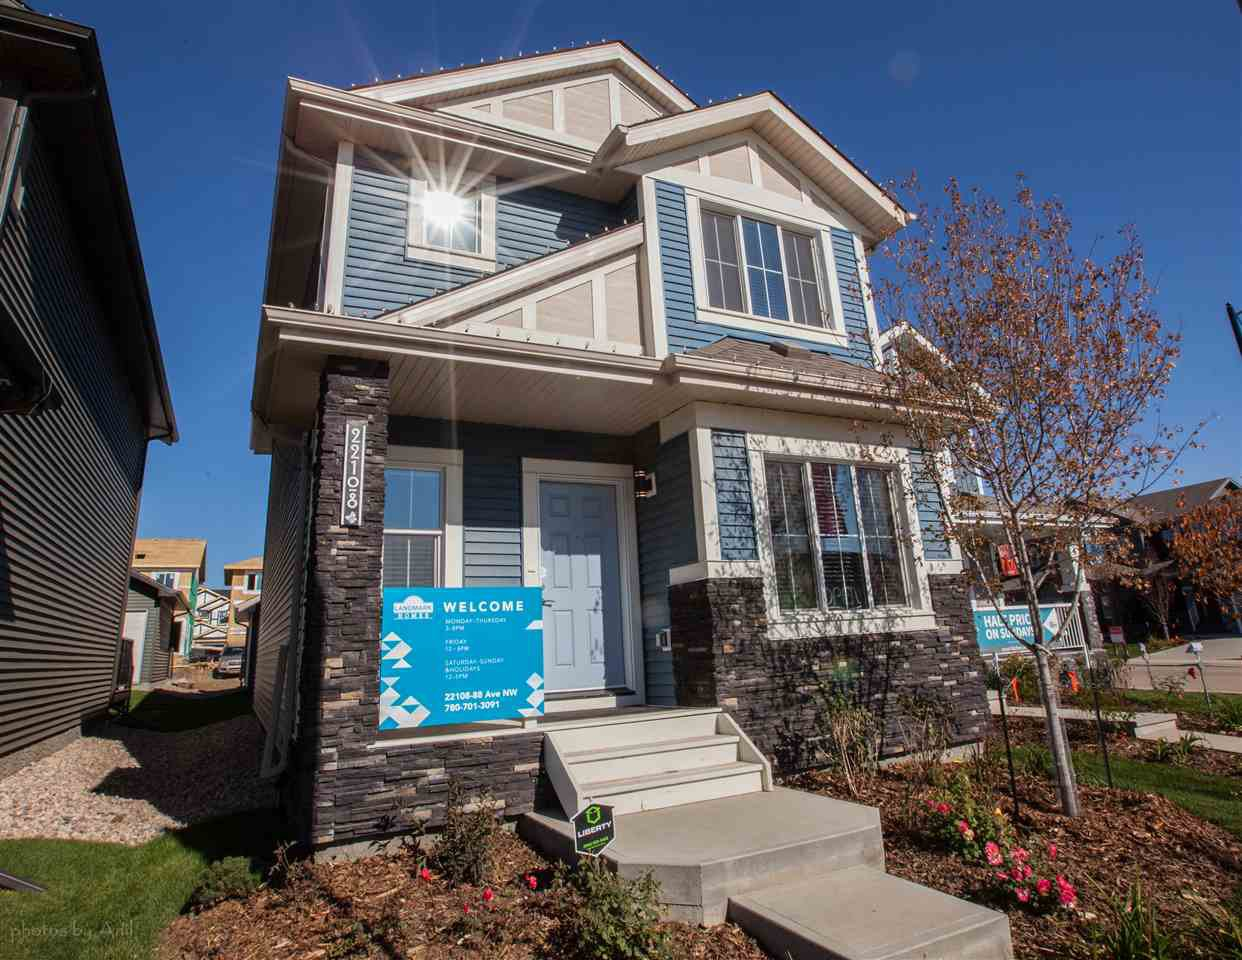 Main Photo: 22108 88 Avenue in Edmonton: Zone 58 House for sale : MLS®# E4178466